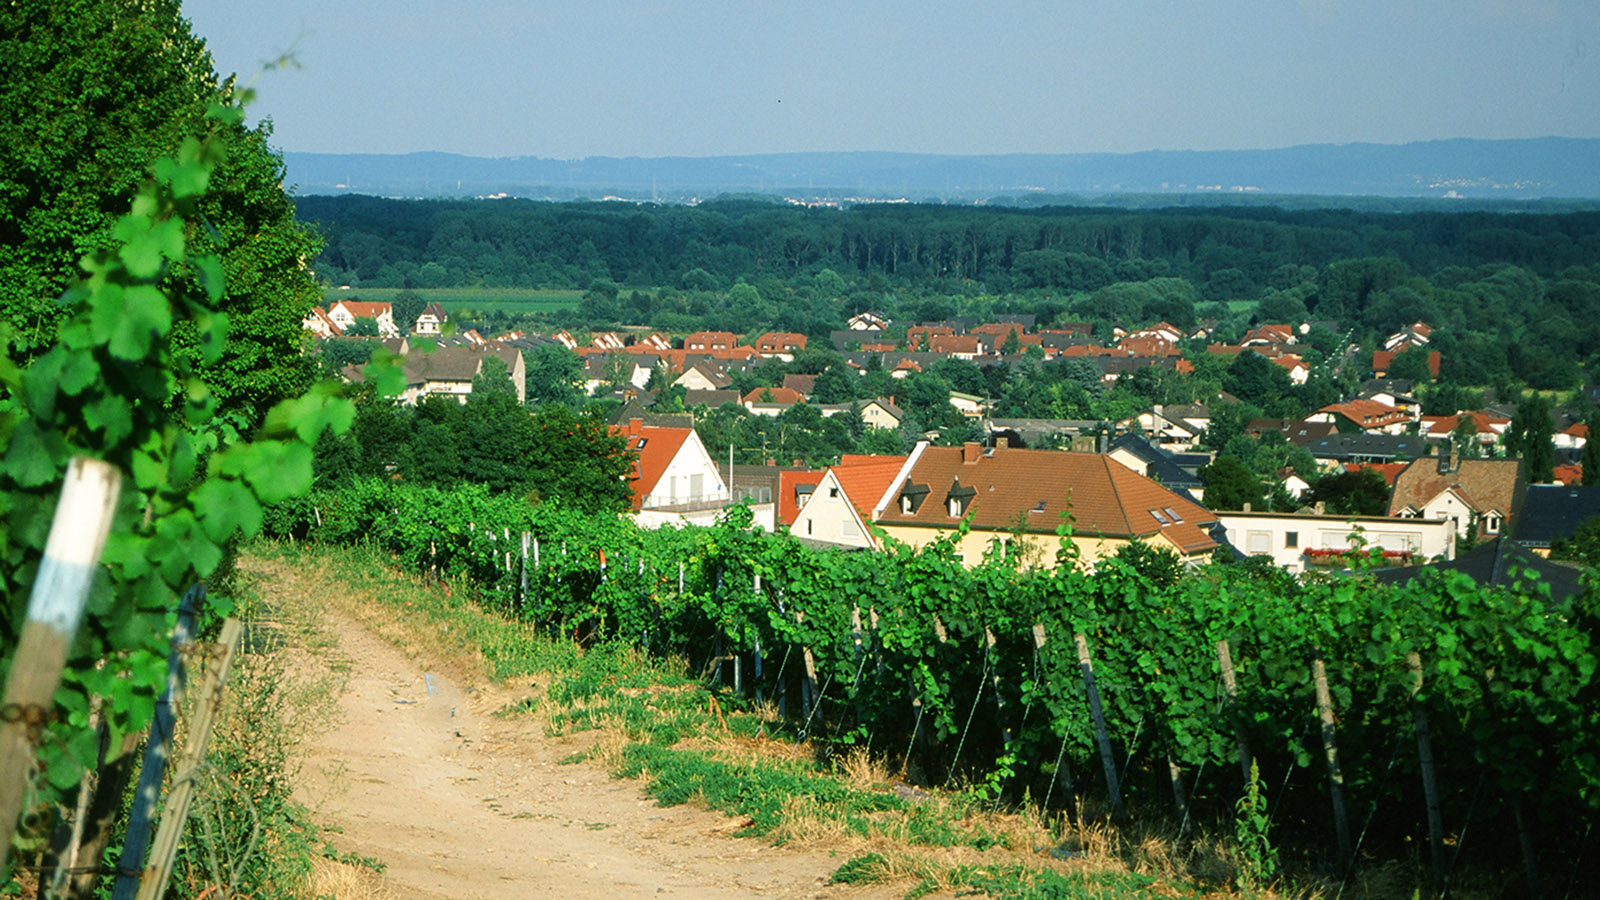 Weinland Rheinland-Pfalz. Foto: Hilke Maunder